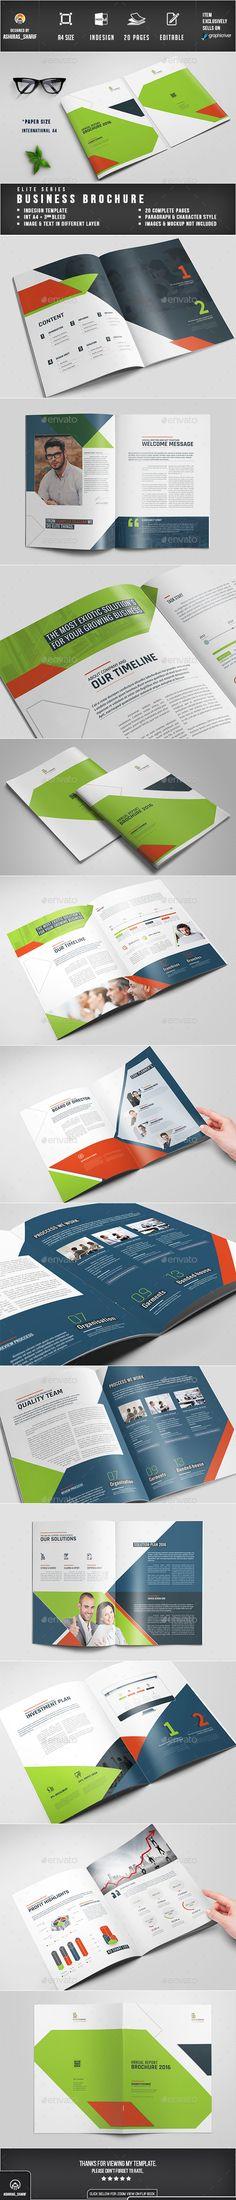 Brochure Indesign Brochure Templates, Travel Brochure Template, Letterhead Template, Brochure Layout, Brochure Design, Creative Brochure, Corporate Brochure, Business Brochure, Company Profile Design